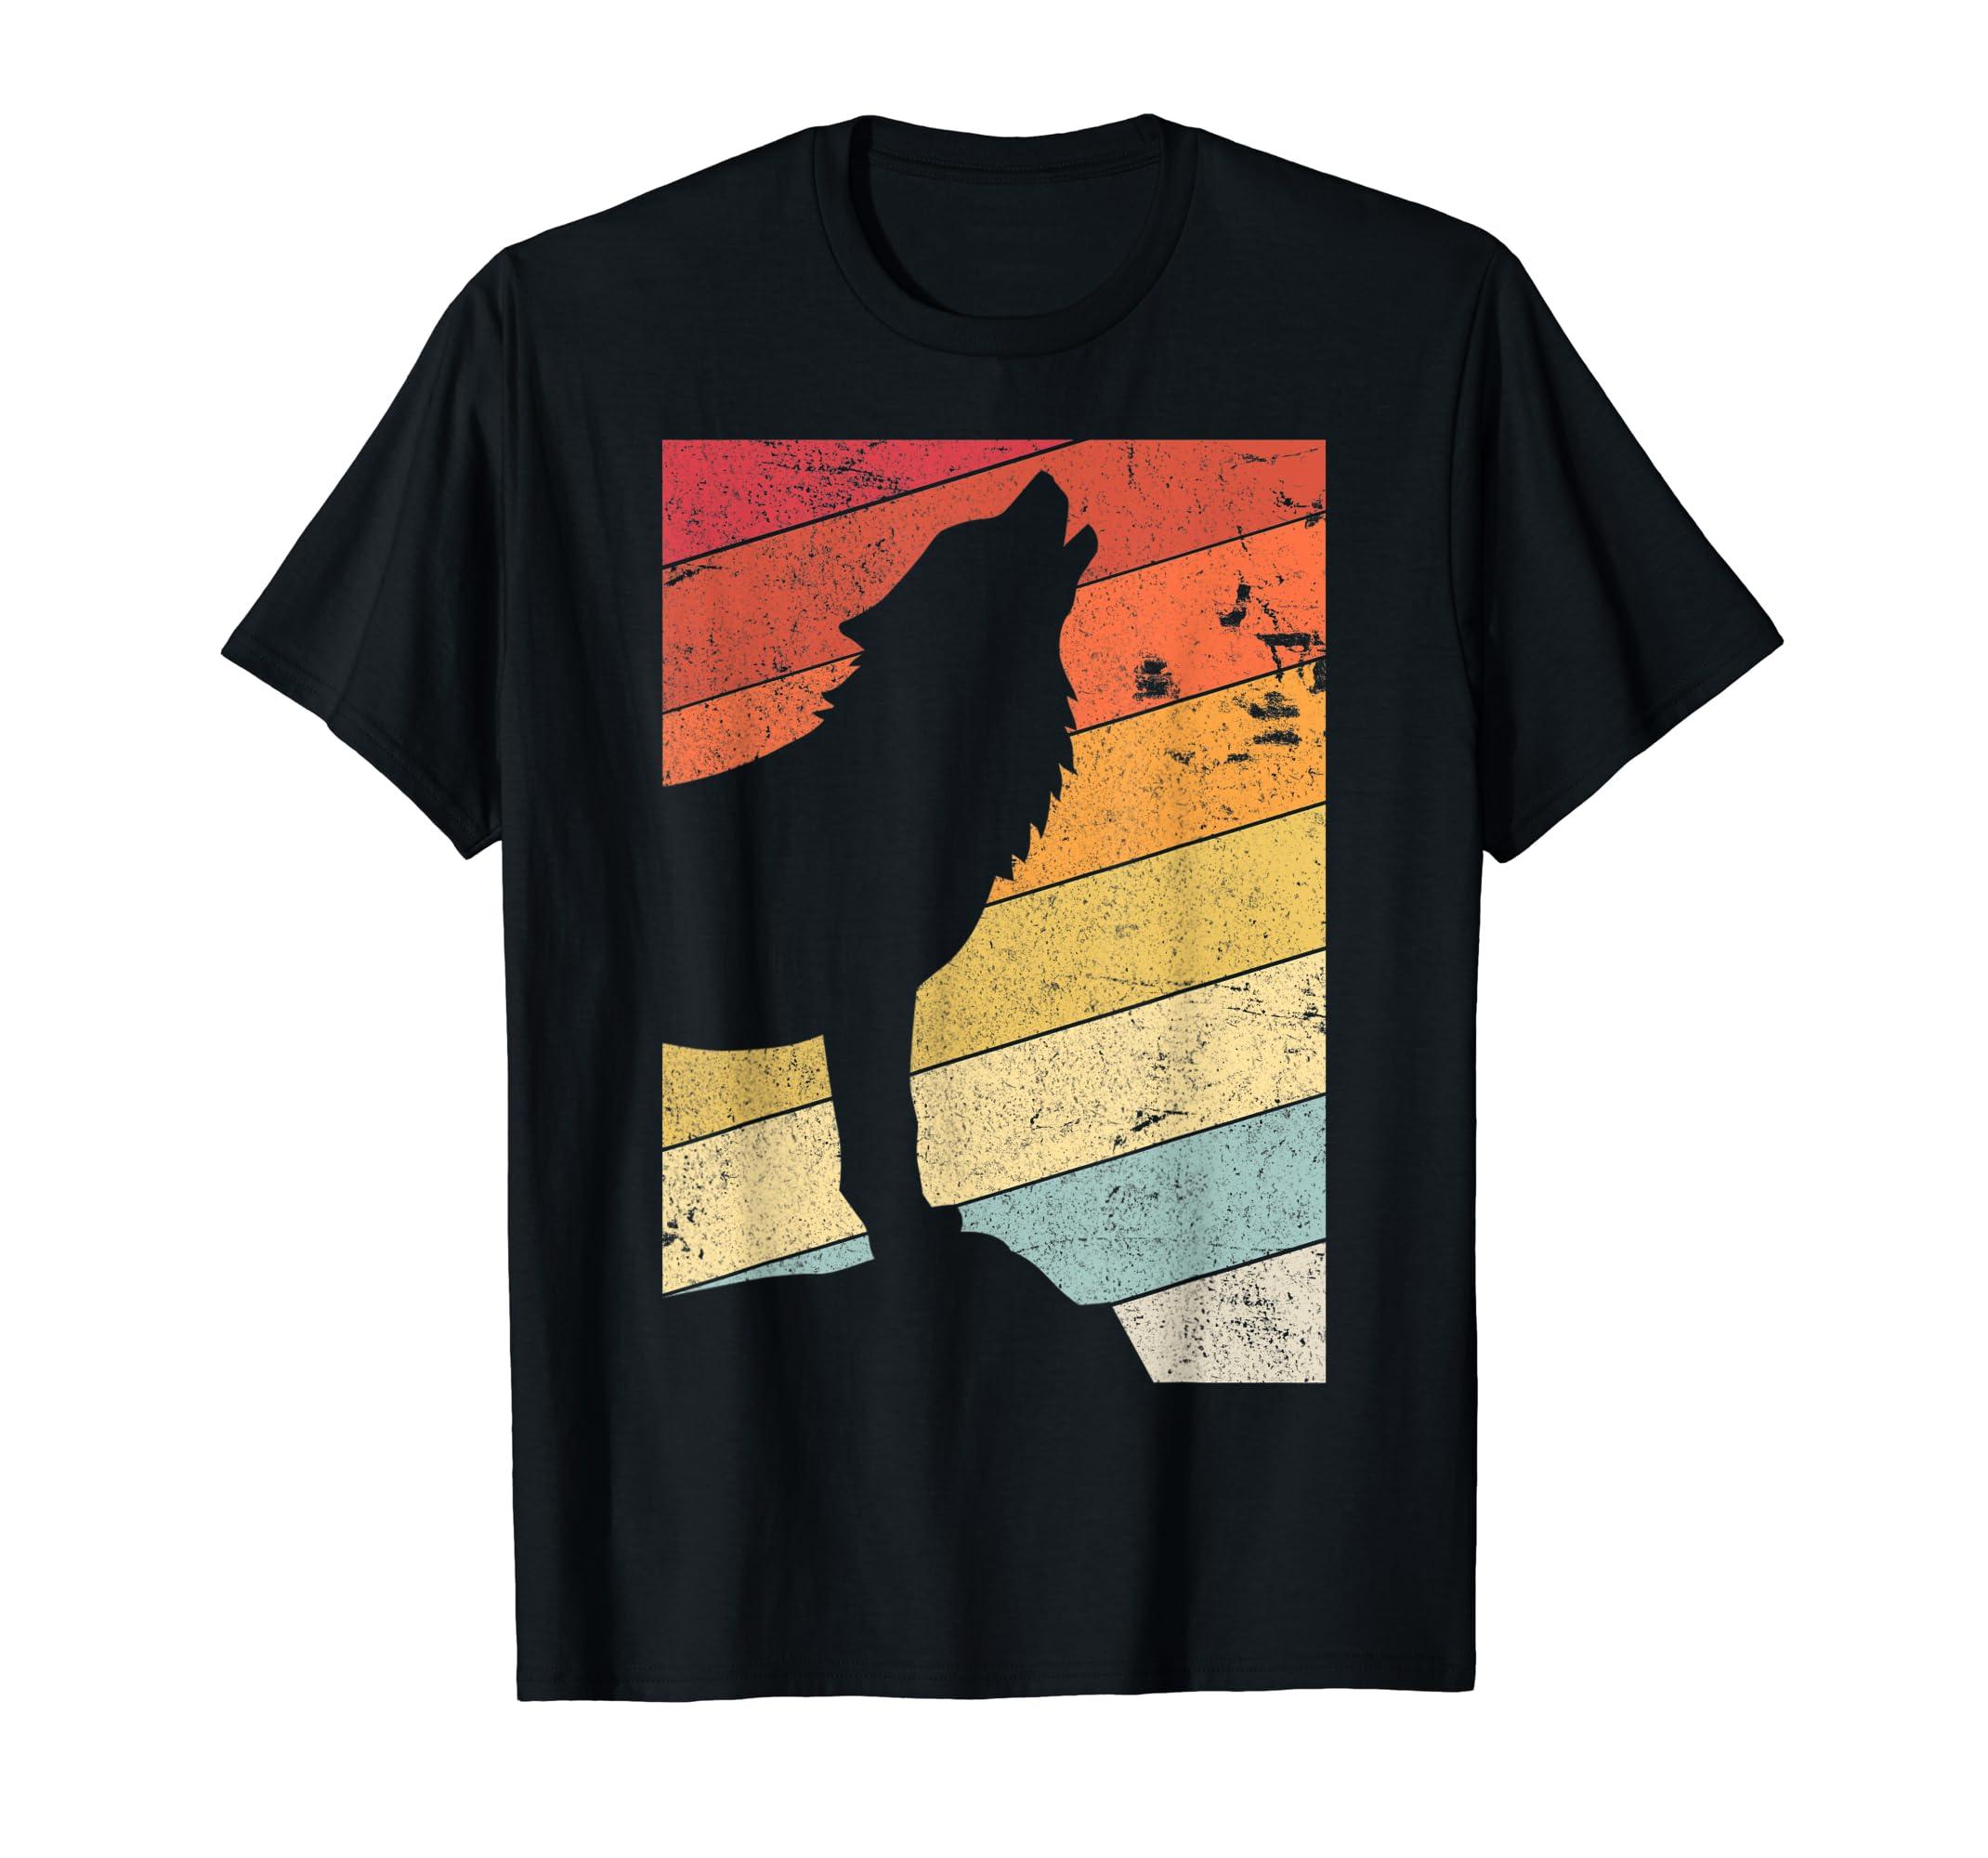 Wolf Shirt. Retro Style T-Shirt-Men's T-Shirt-Black